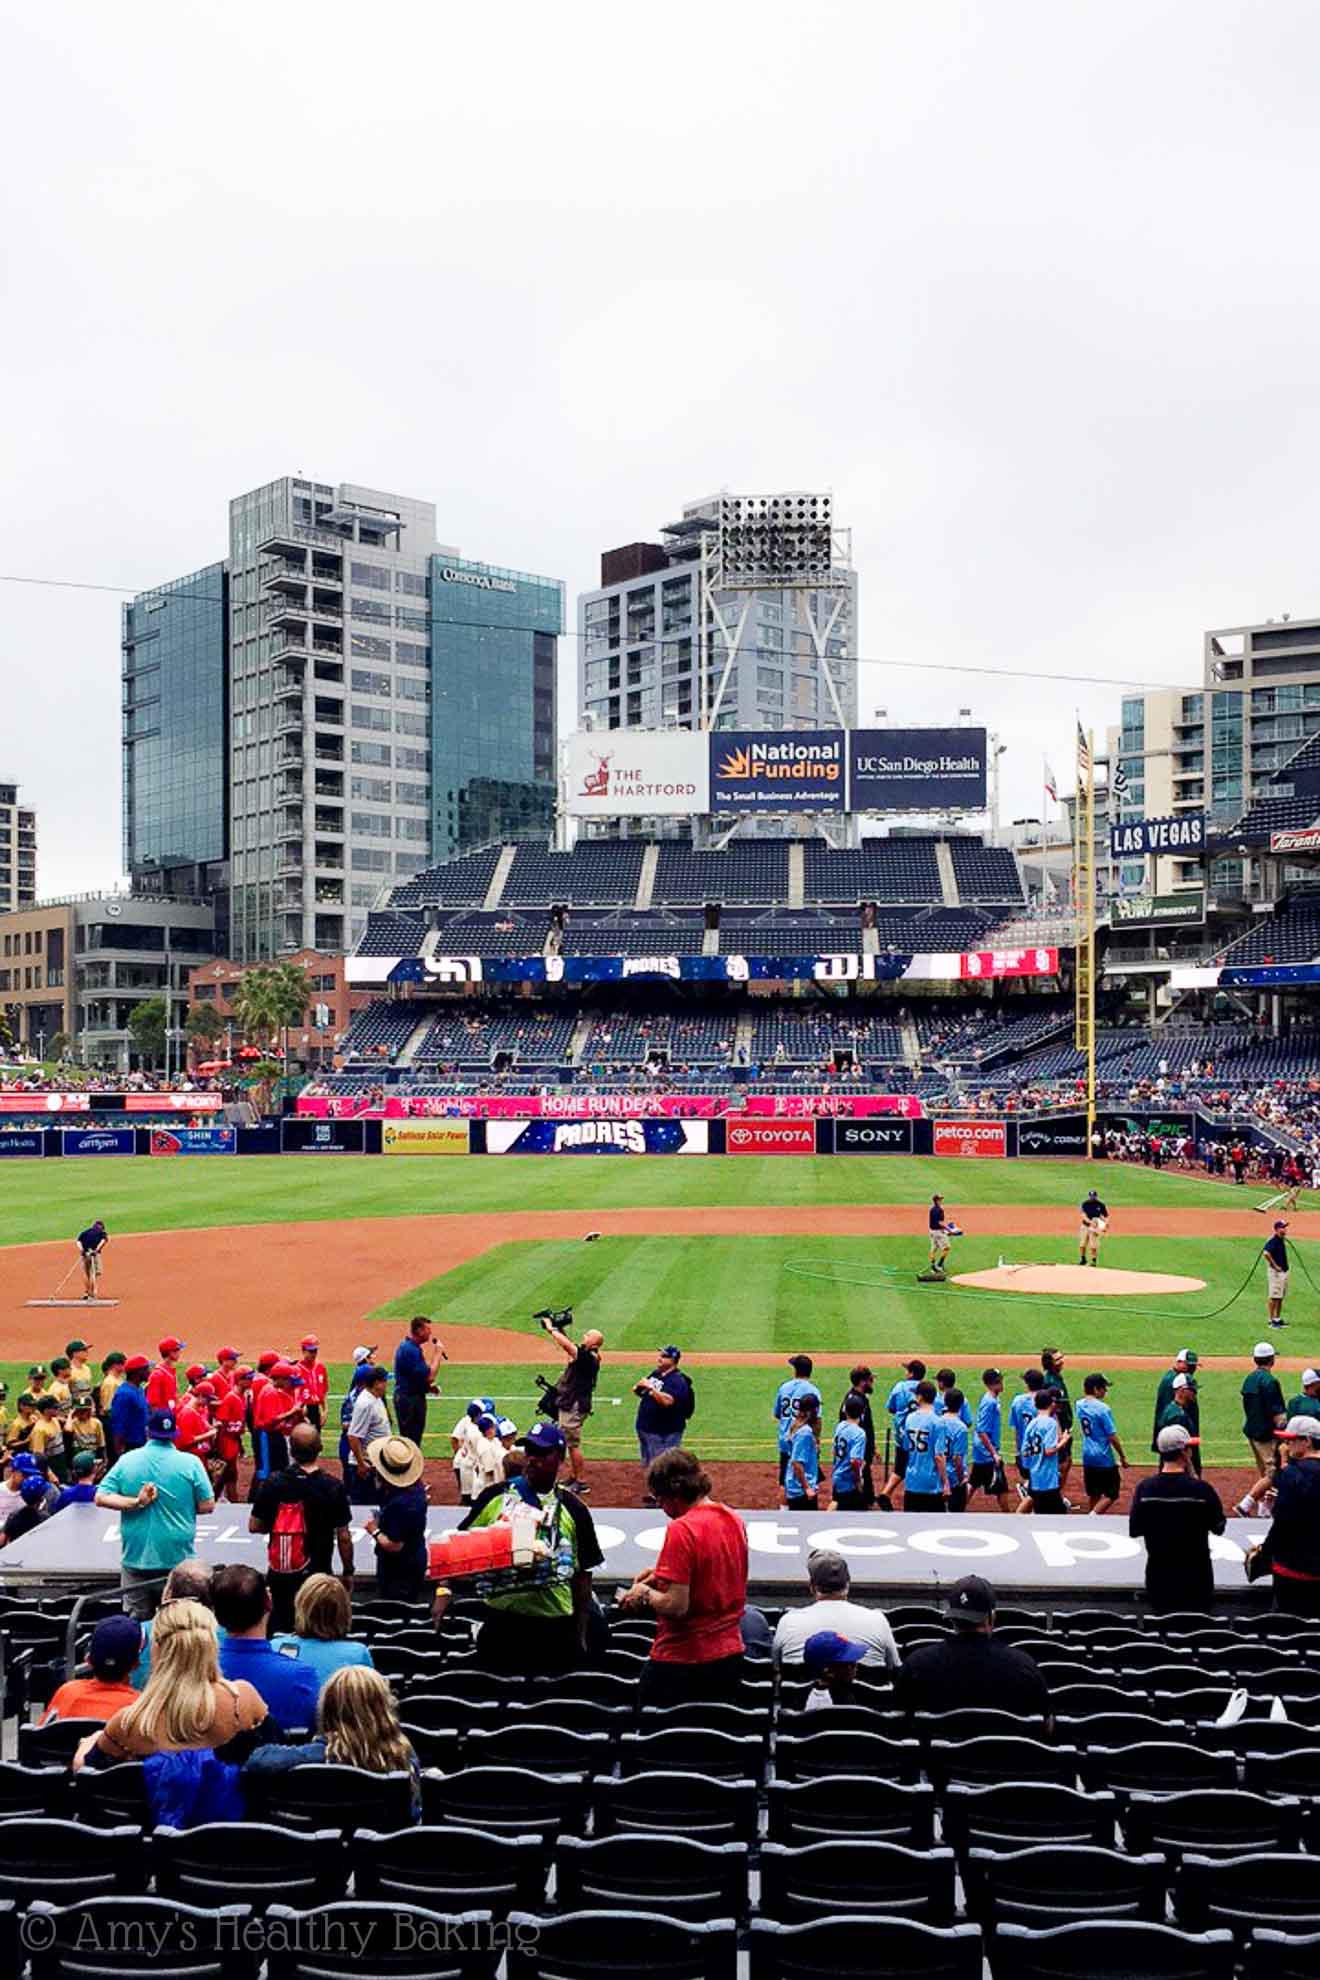 Exploring San Diego! @amybakeshealthy | Padres Baseball Games!